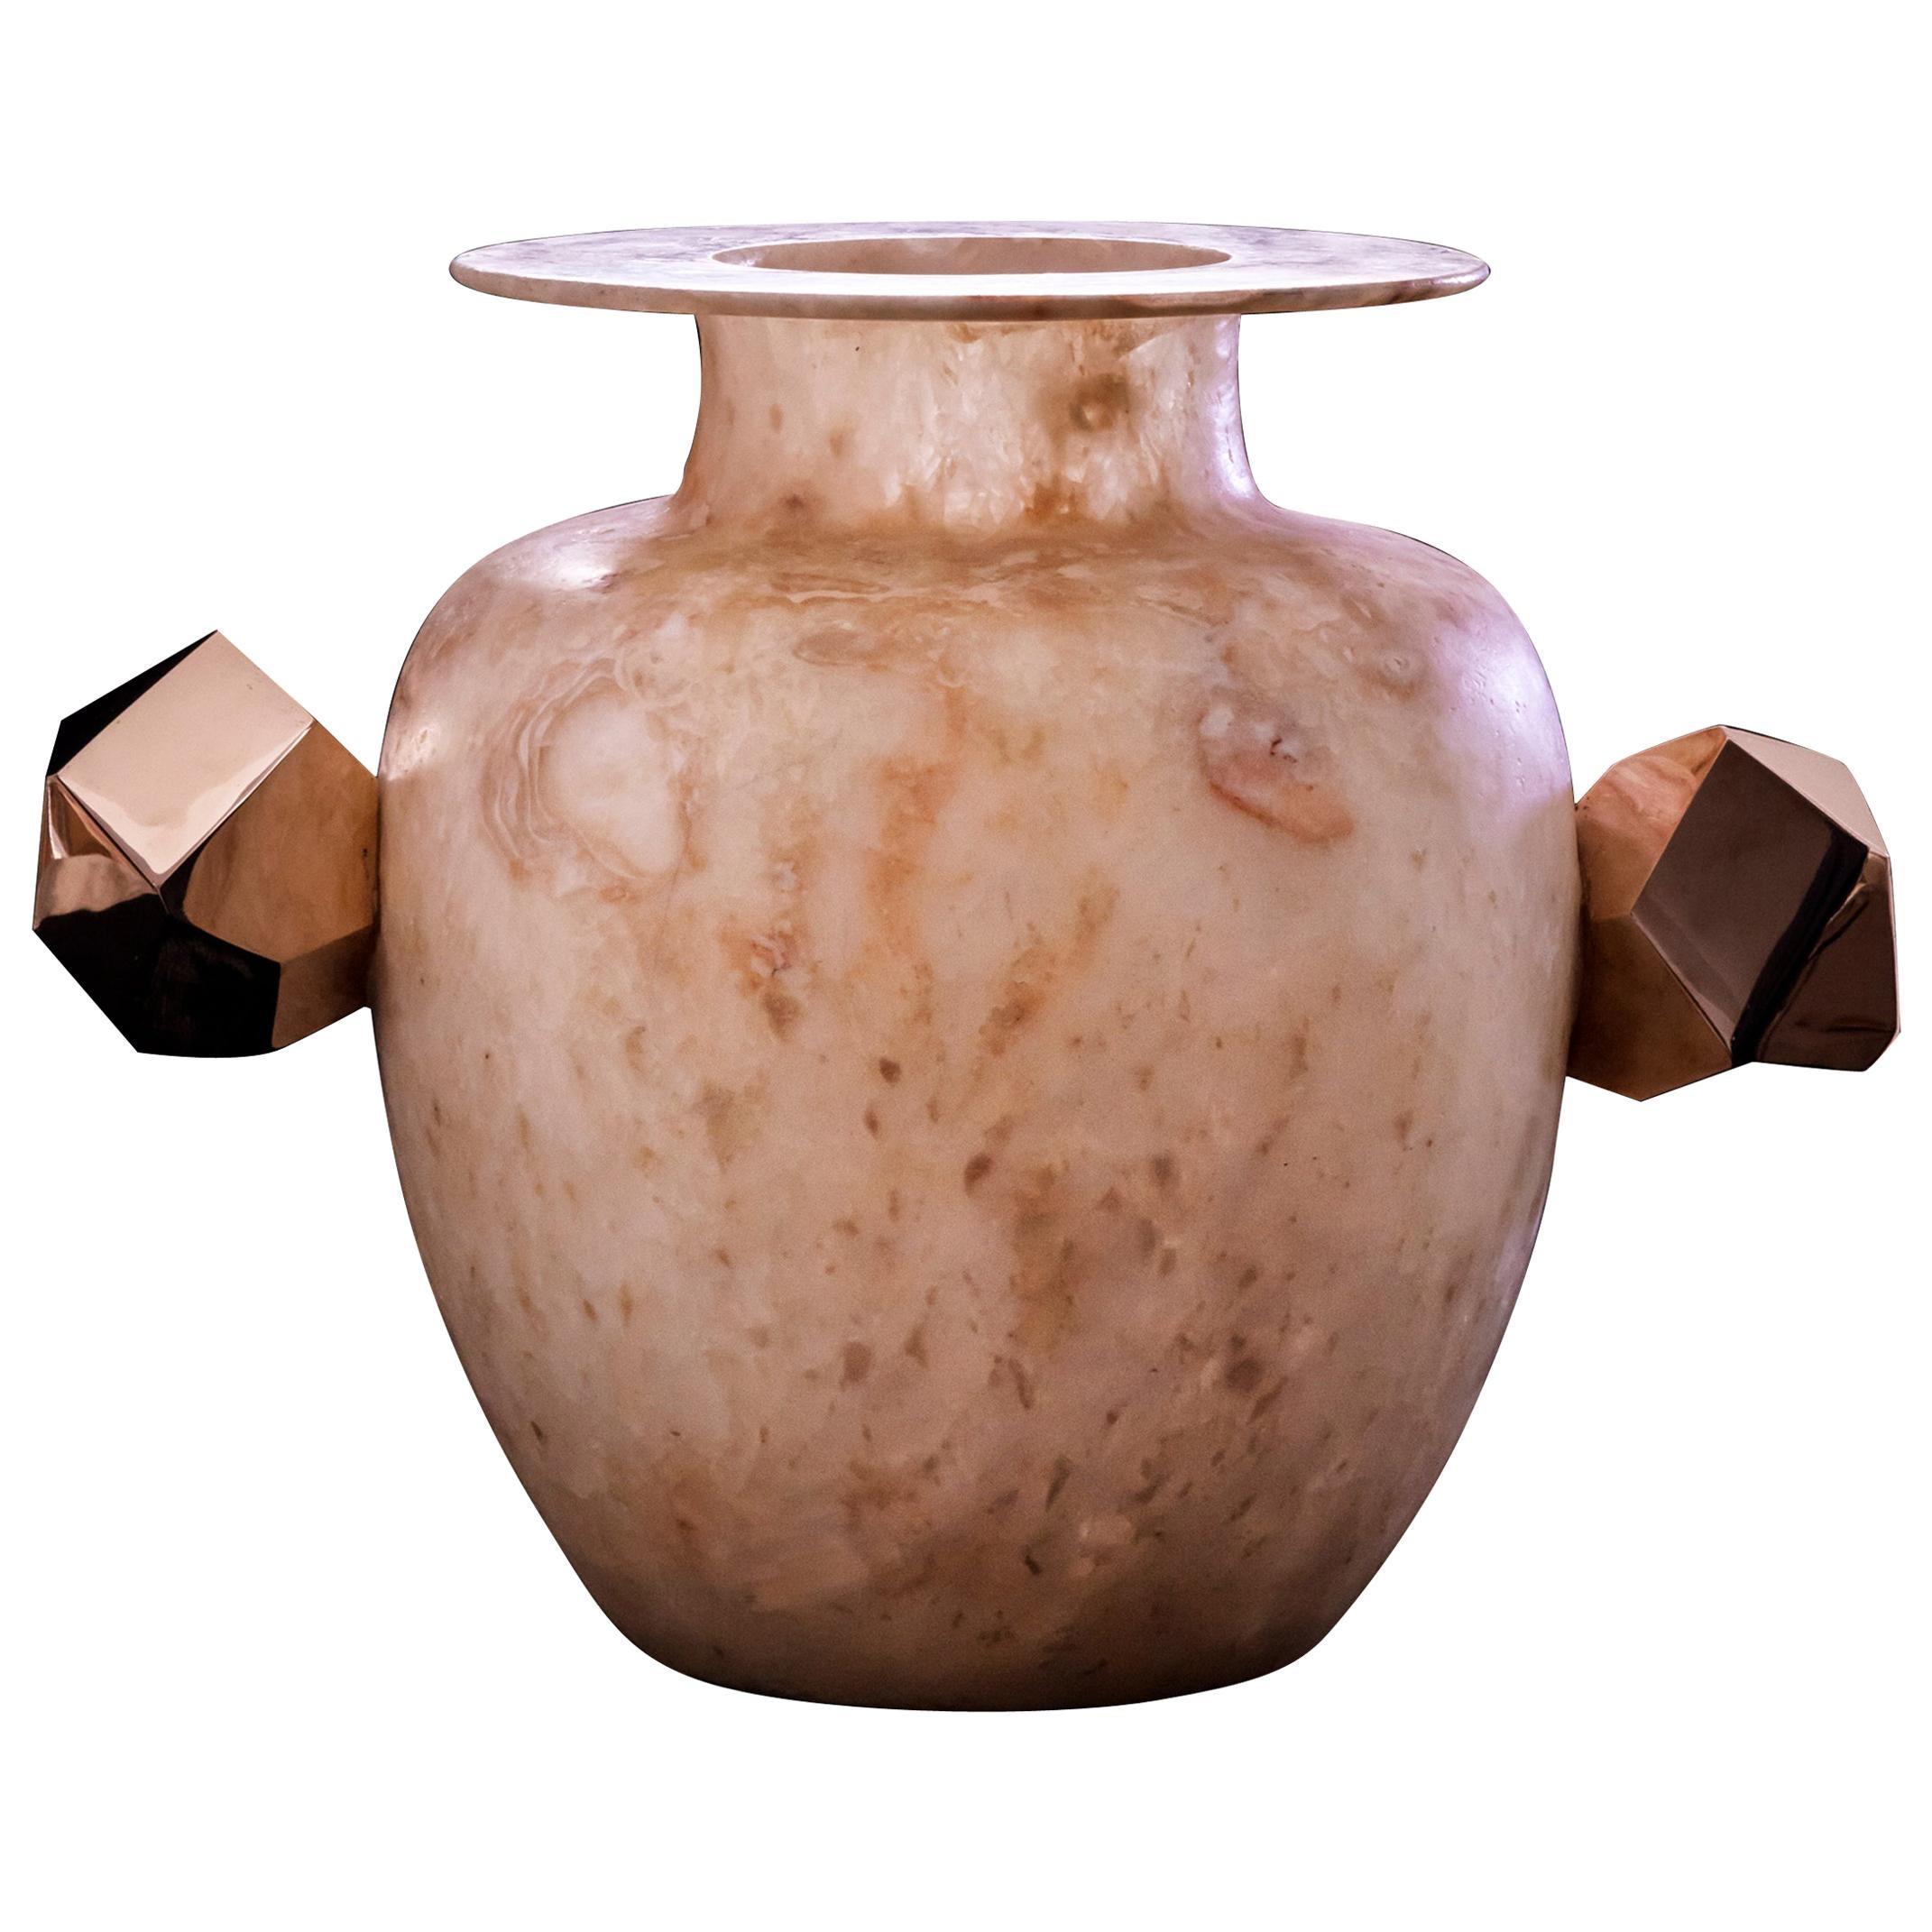 Achille Salvagni Vases and Vessels